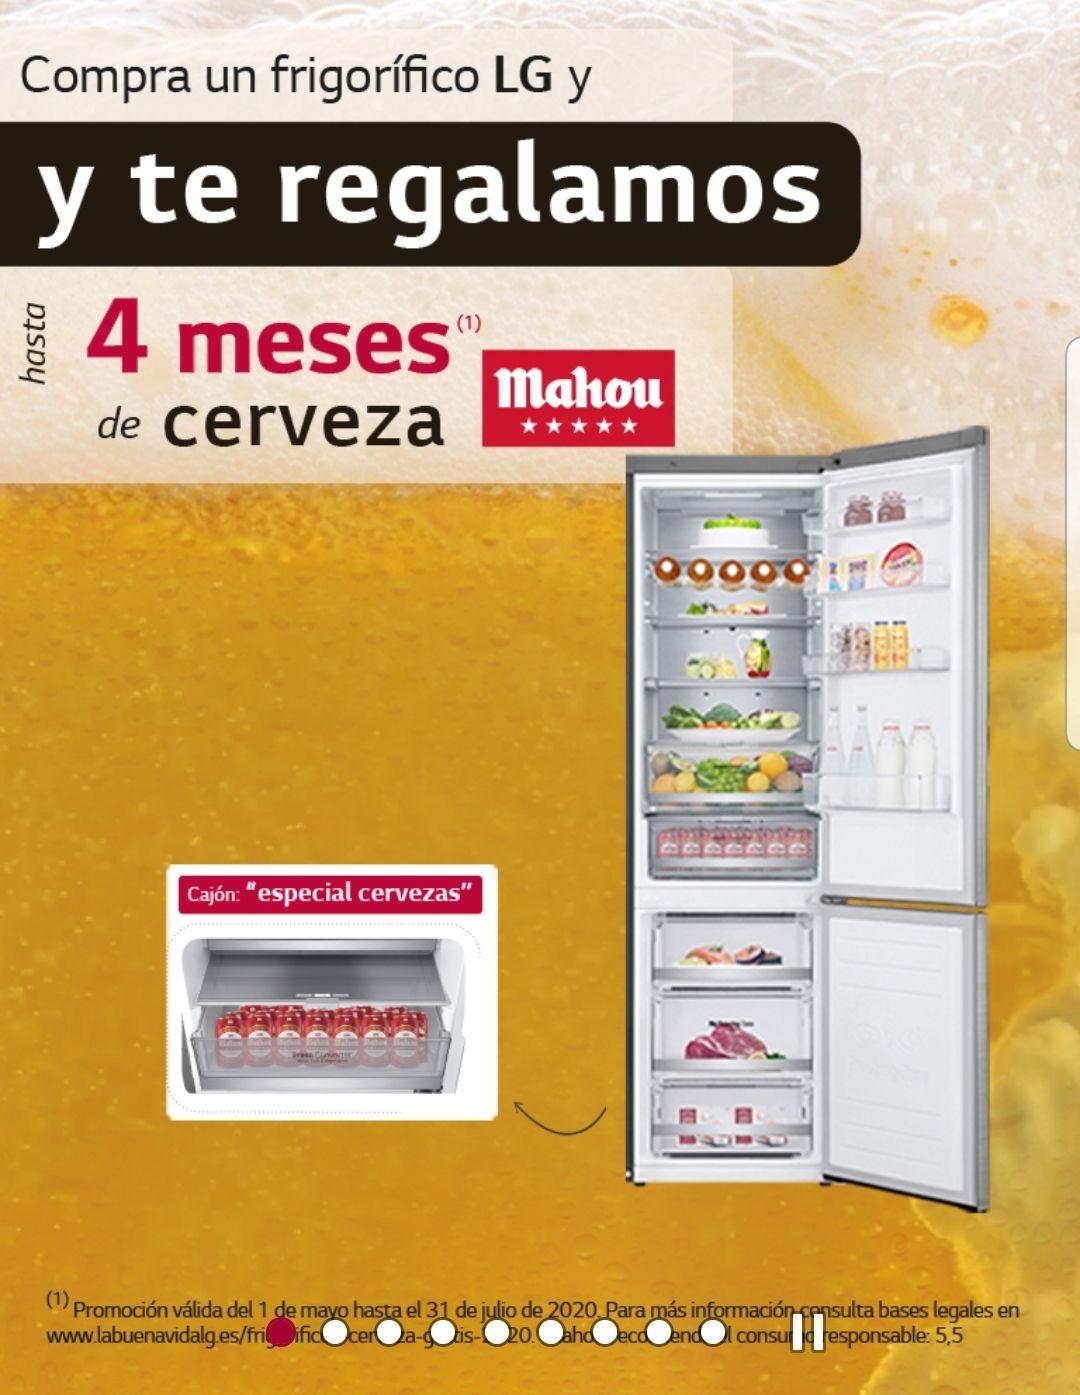 Hasta 4 meses de cerveza Mahou si compras un frigorifico LG